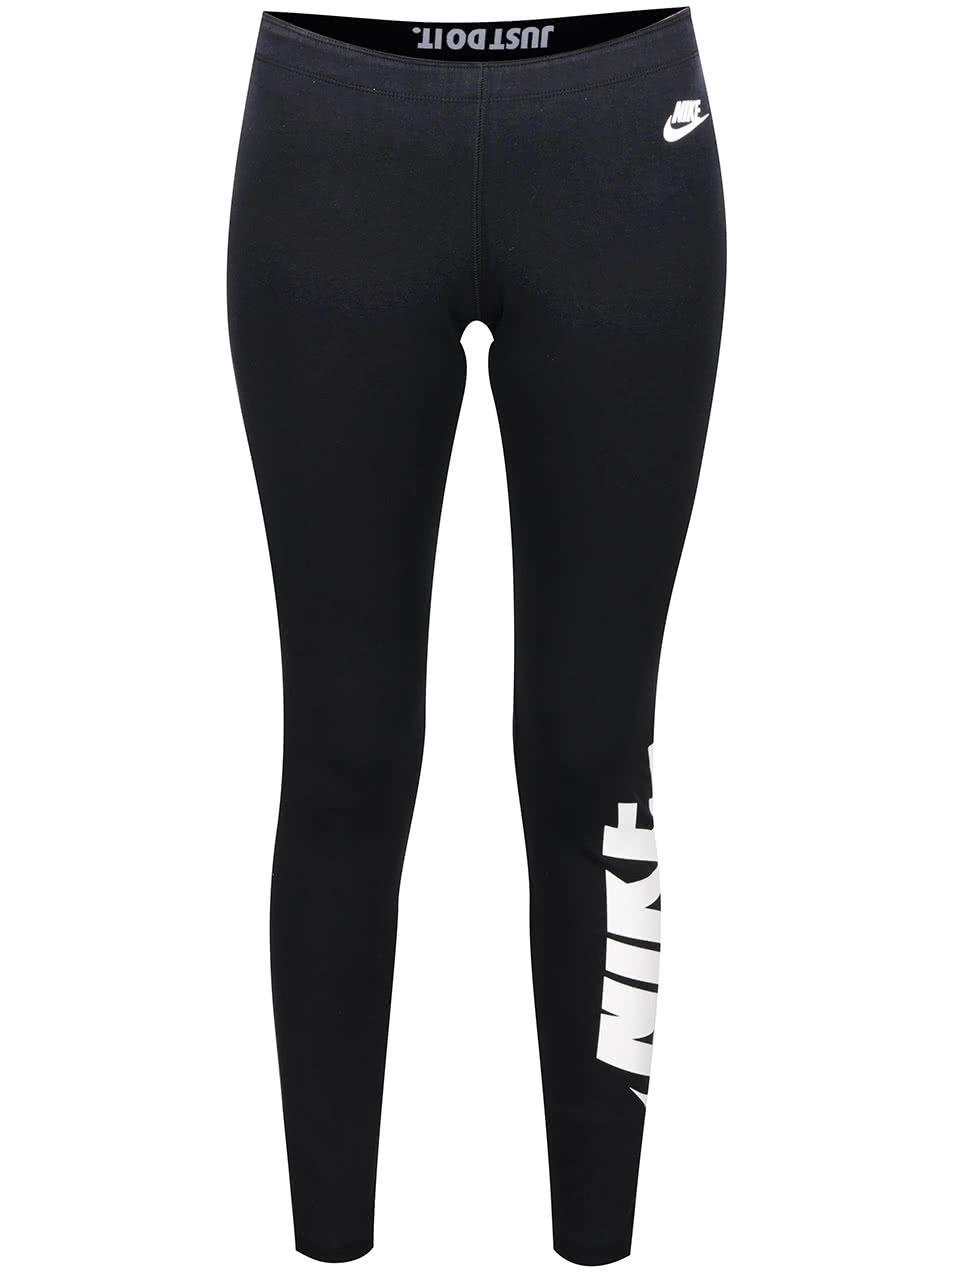 8796a45a84f0 Čierne dámske legíny Nike Sportswear Legging ...